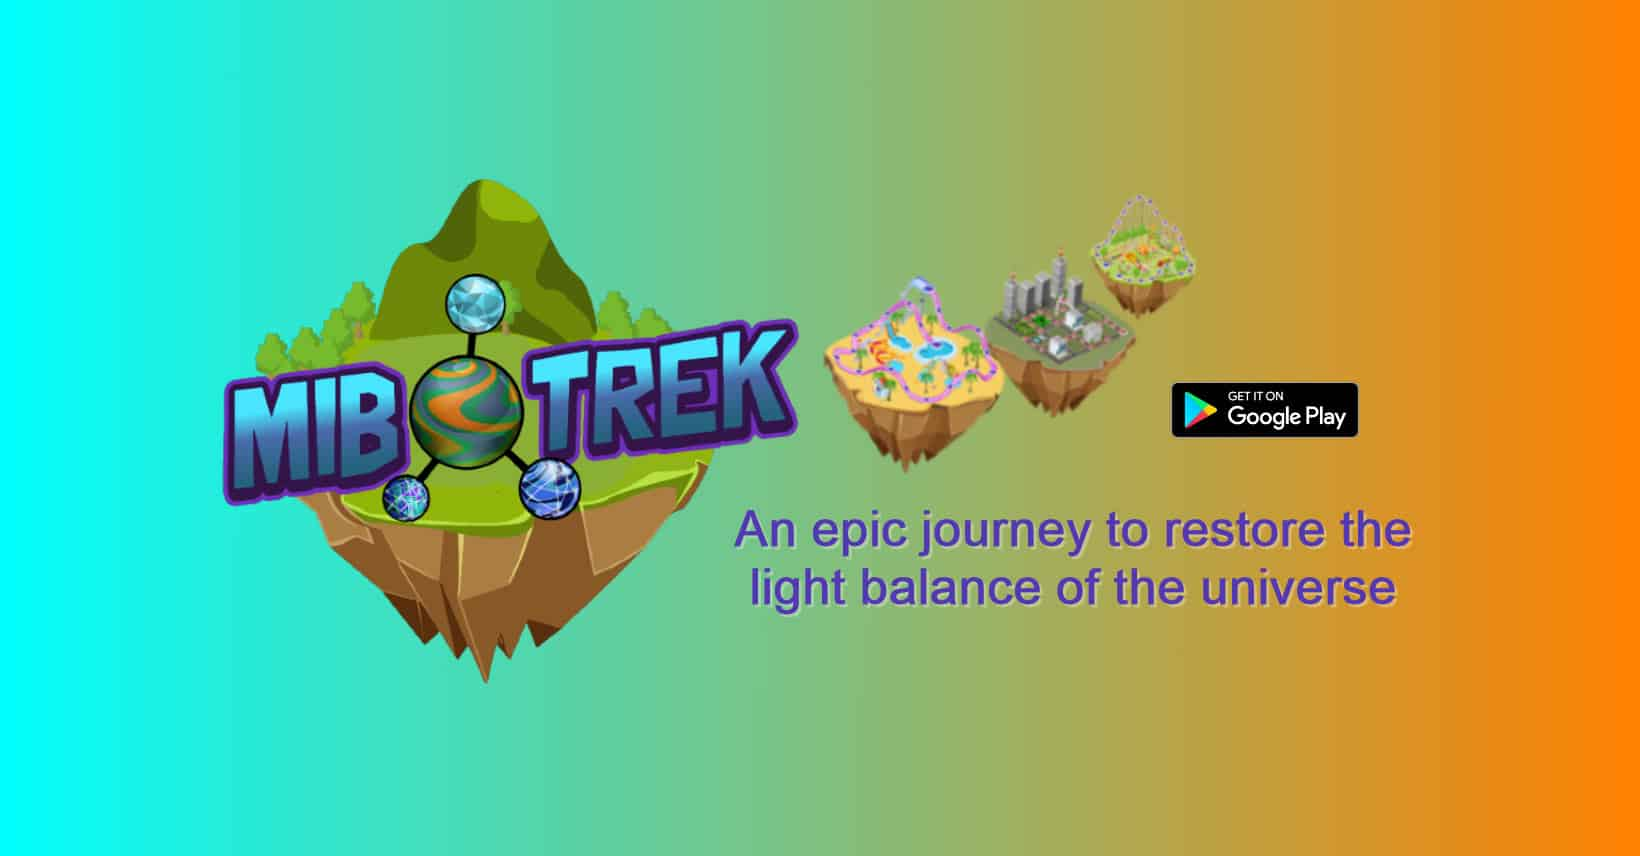 MIB Trek game